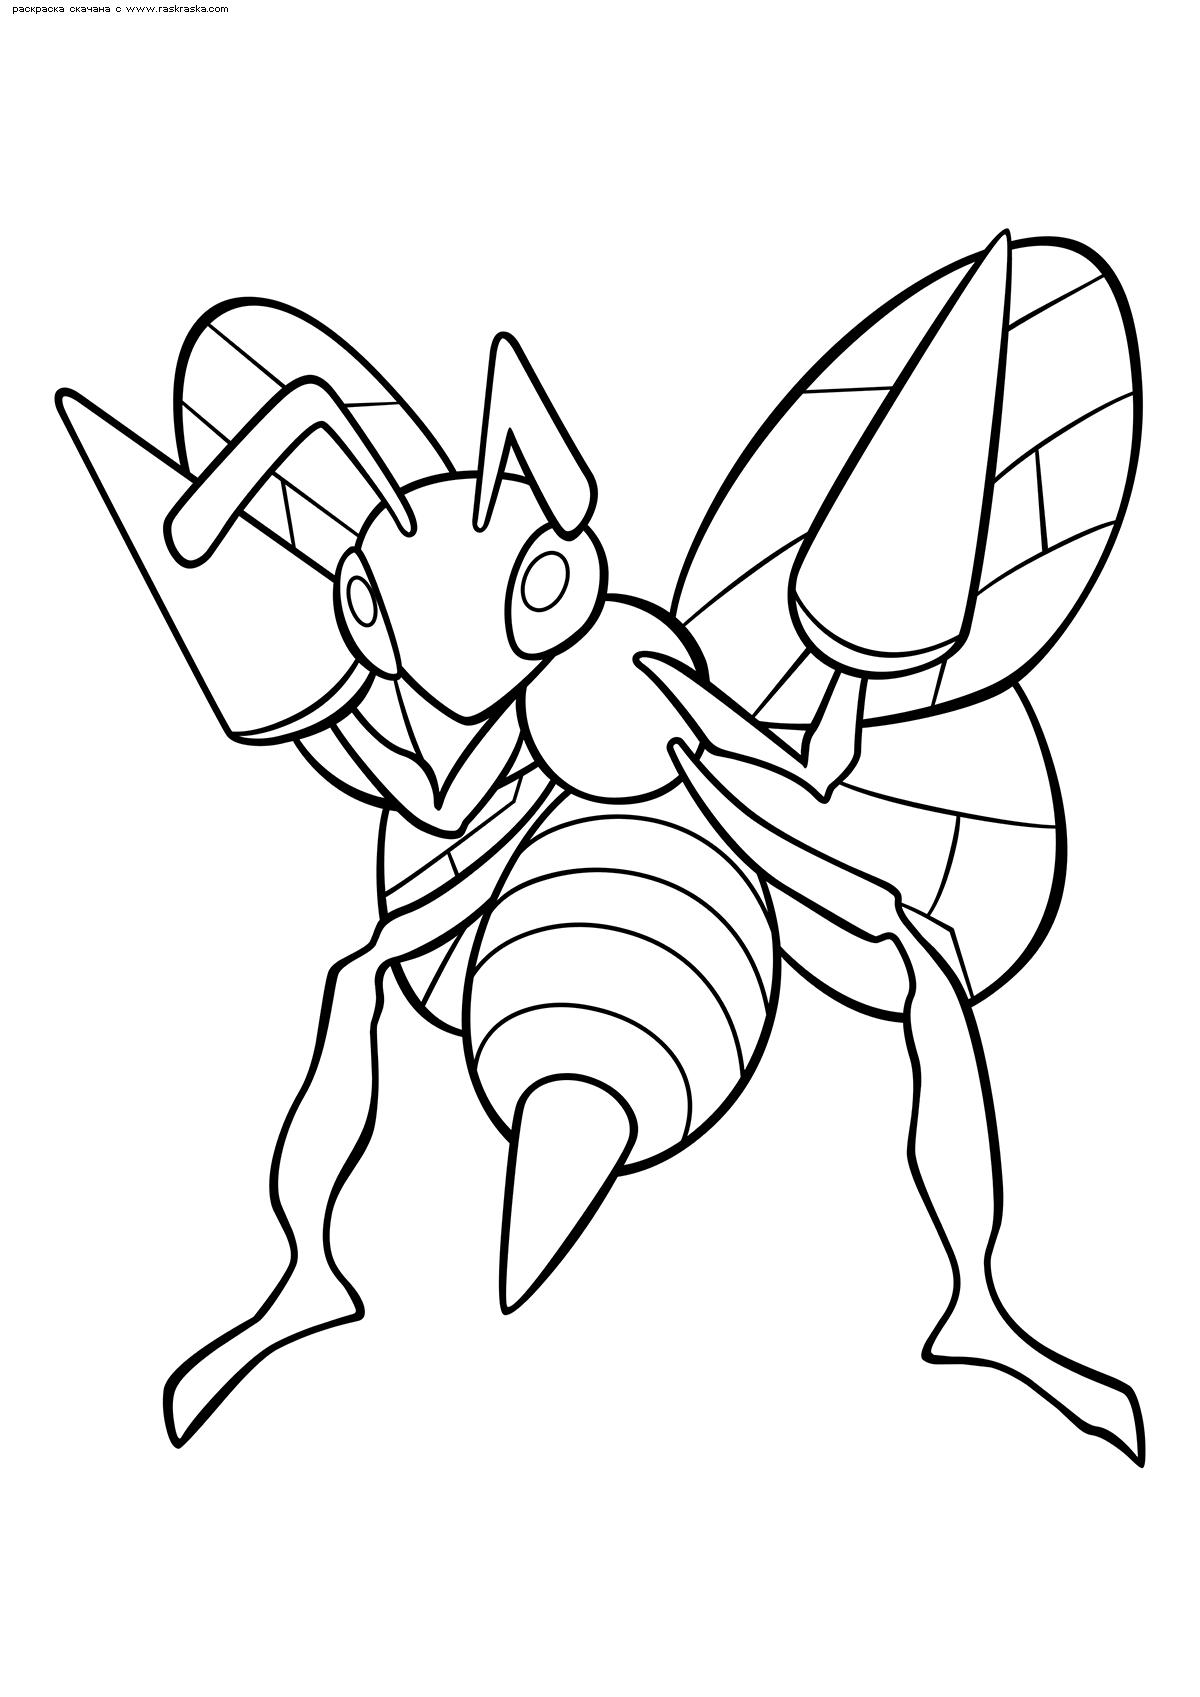 Раскраска Покемон Бидрил (Beedrill) | Раскраски эволюция ...